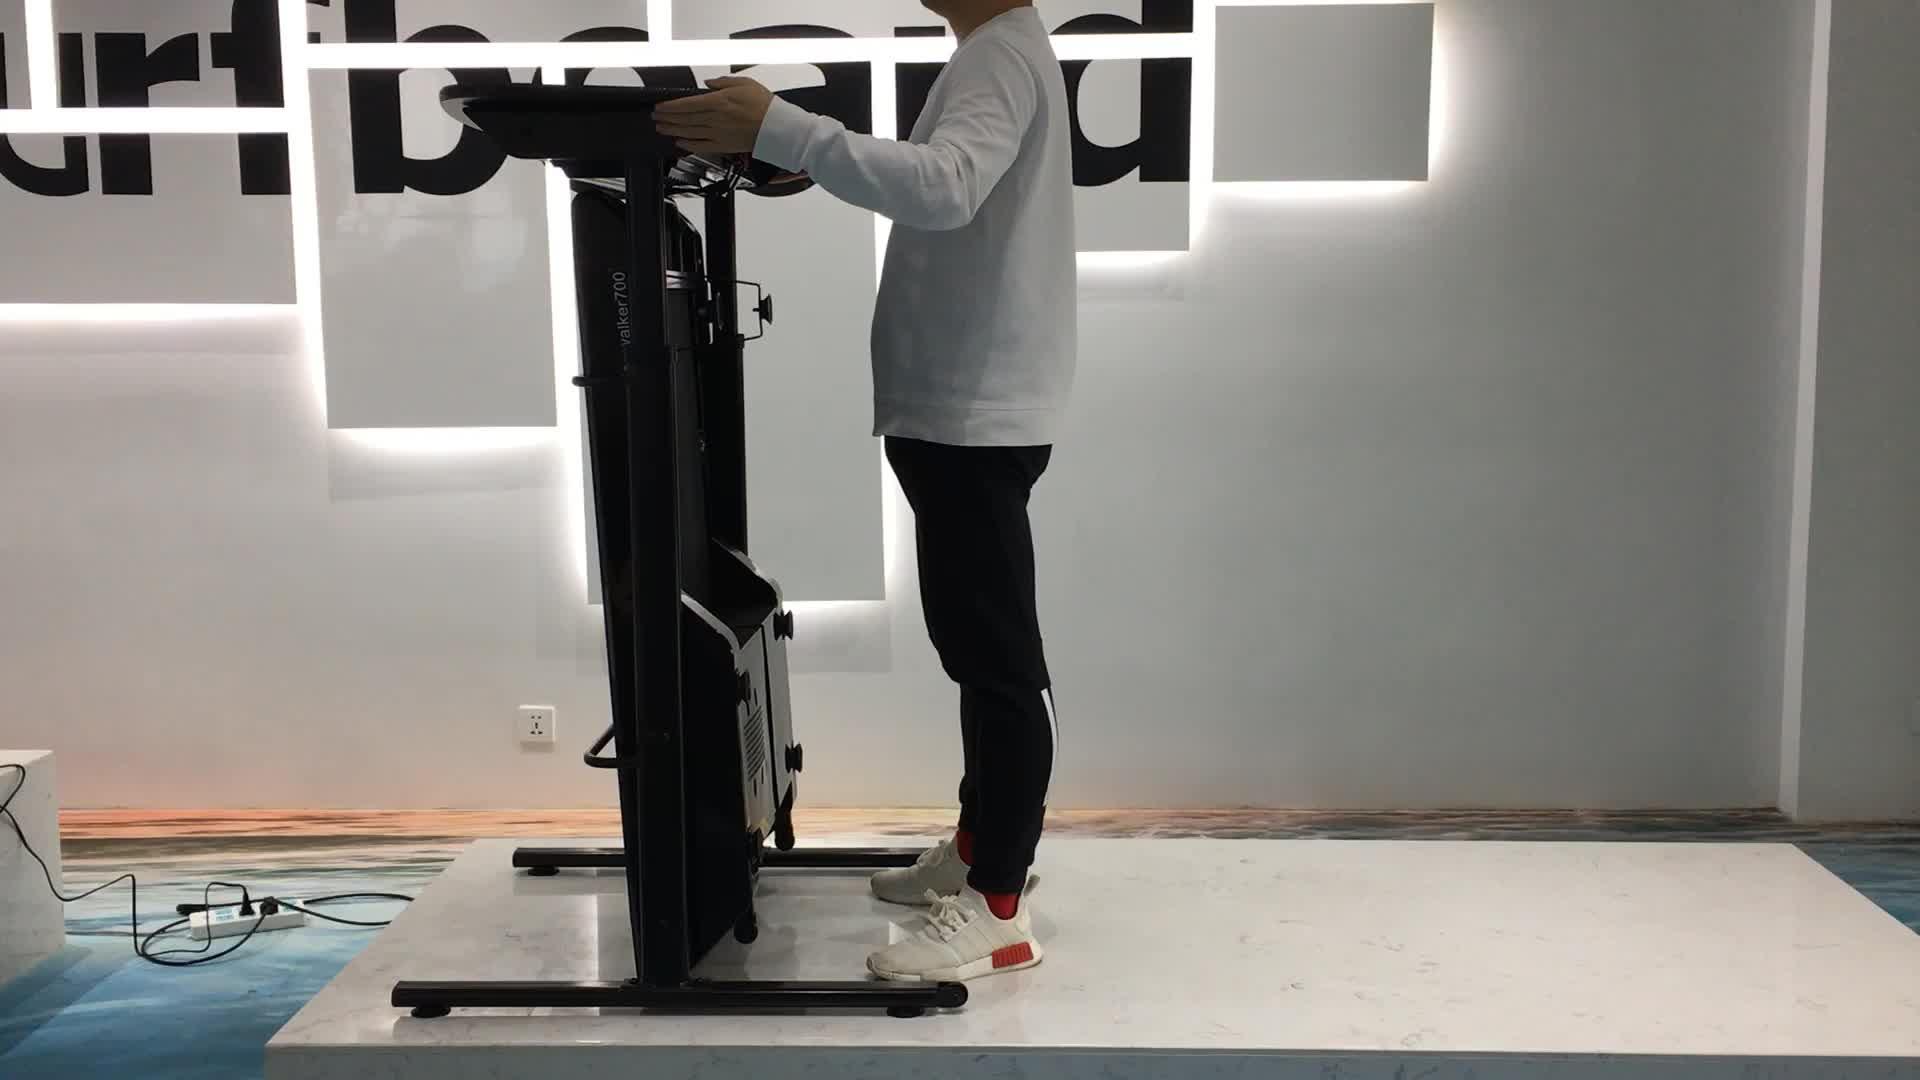 A จีน gym multi-function มอเตอร์เชิงพาณิชย์บ้านออกกำลังกายบาง body strong ไฟฟ้า DC มอเตอร์เดินโต๊ะลู่วิ่ง